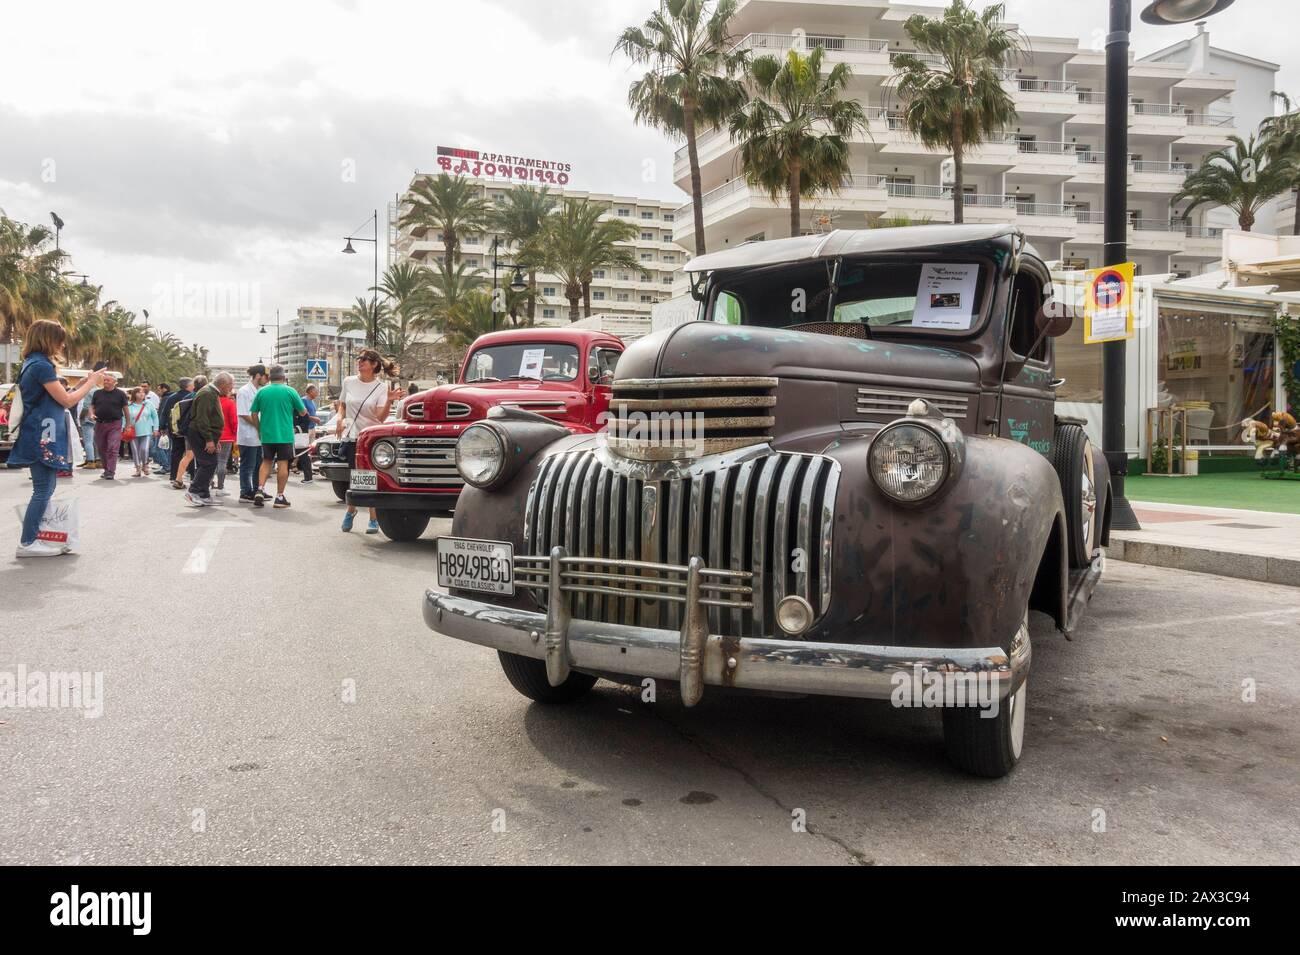 1946 Chevrolet Pickup Truck Chevy 350 700R4, on display during street festival. Torremolinos, Spain. Stock Photo